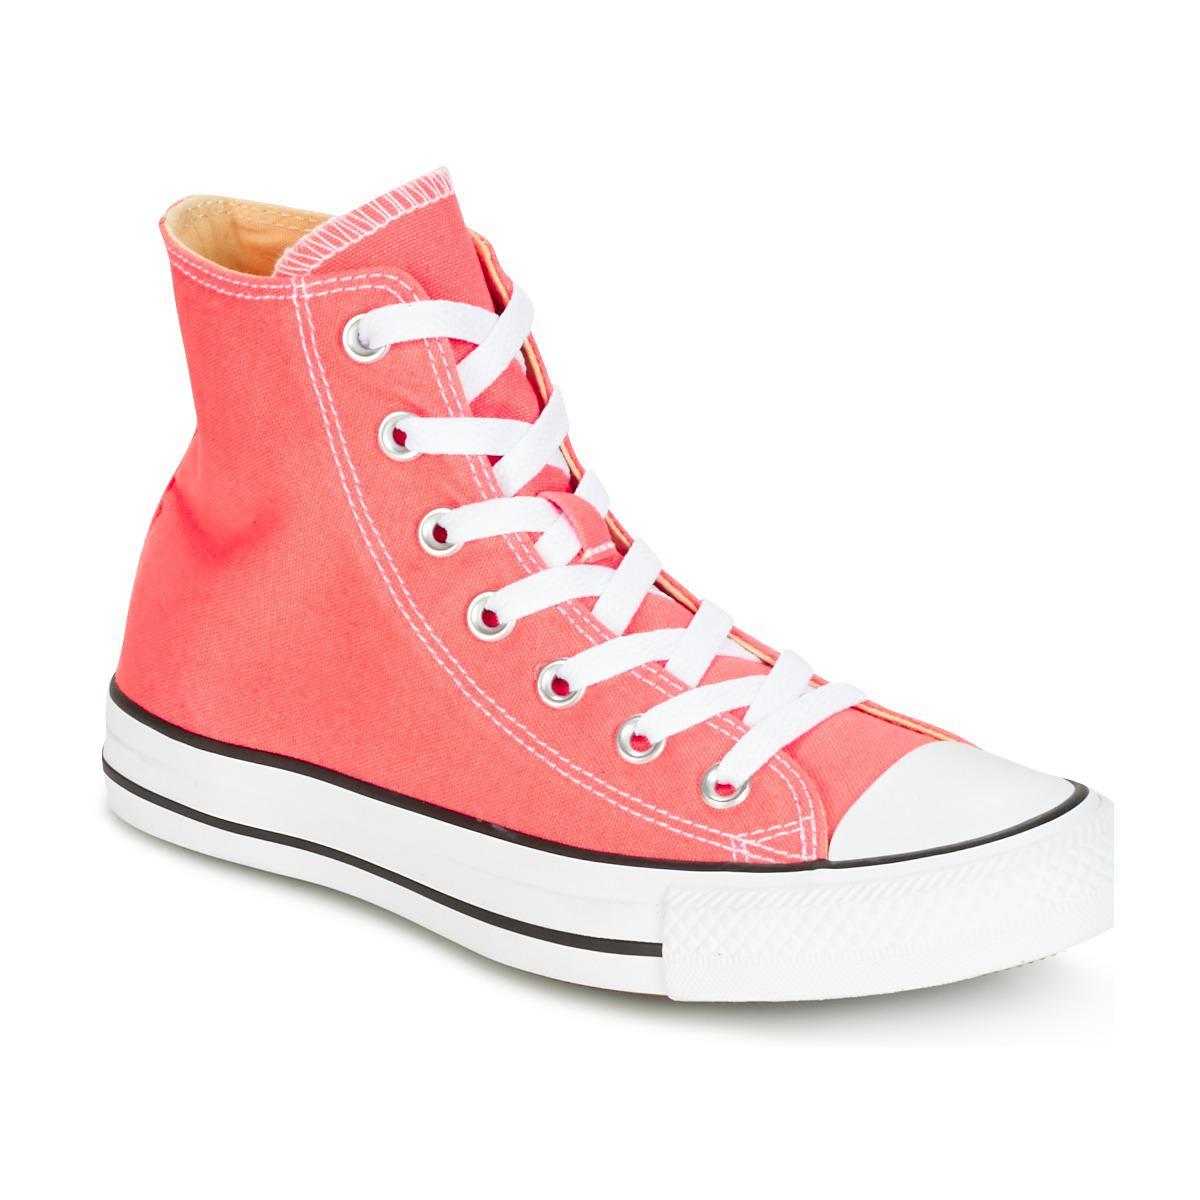 021b36fc5bef Converse. Chuck Taylor All Star Seasonal Colour Hi Seasonal Colour Hi  Sunblu Women s Shoes ...